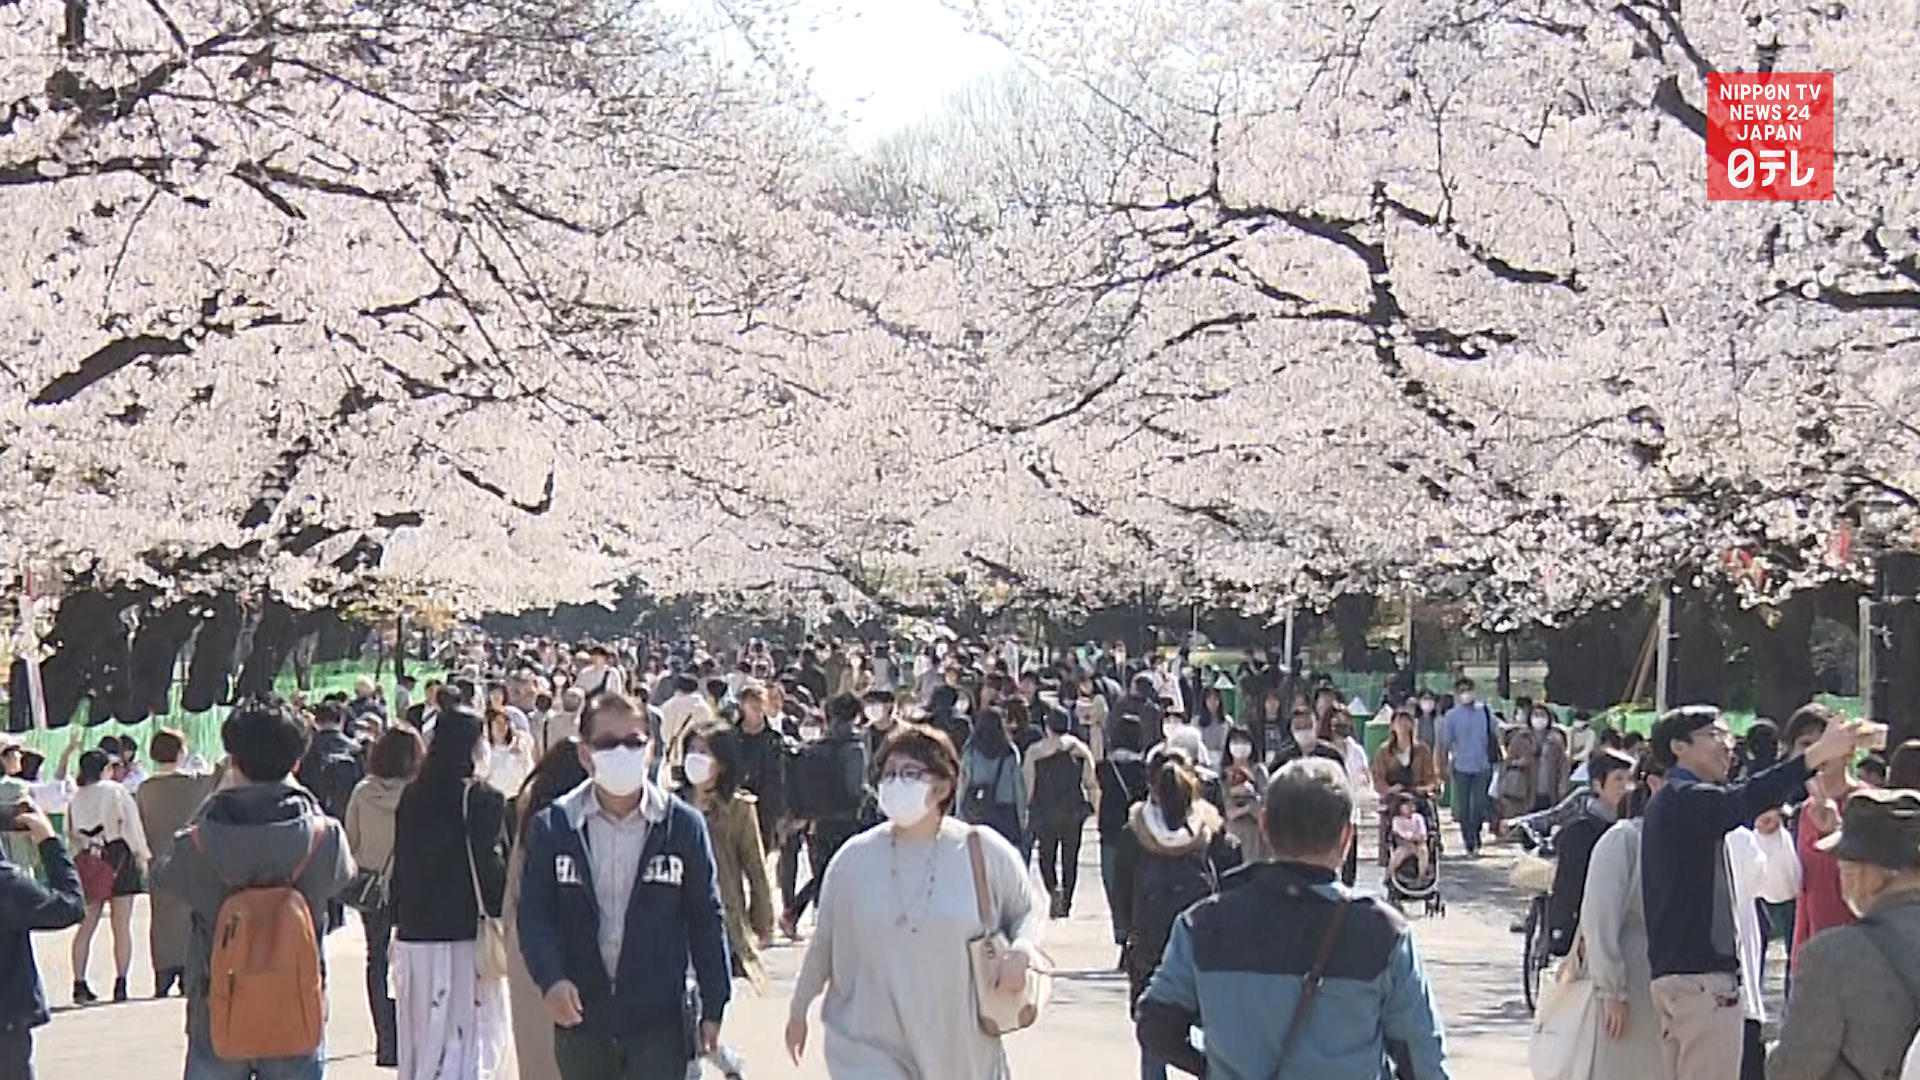 Tokyo urges no cherry blossom parties